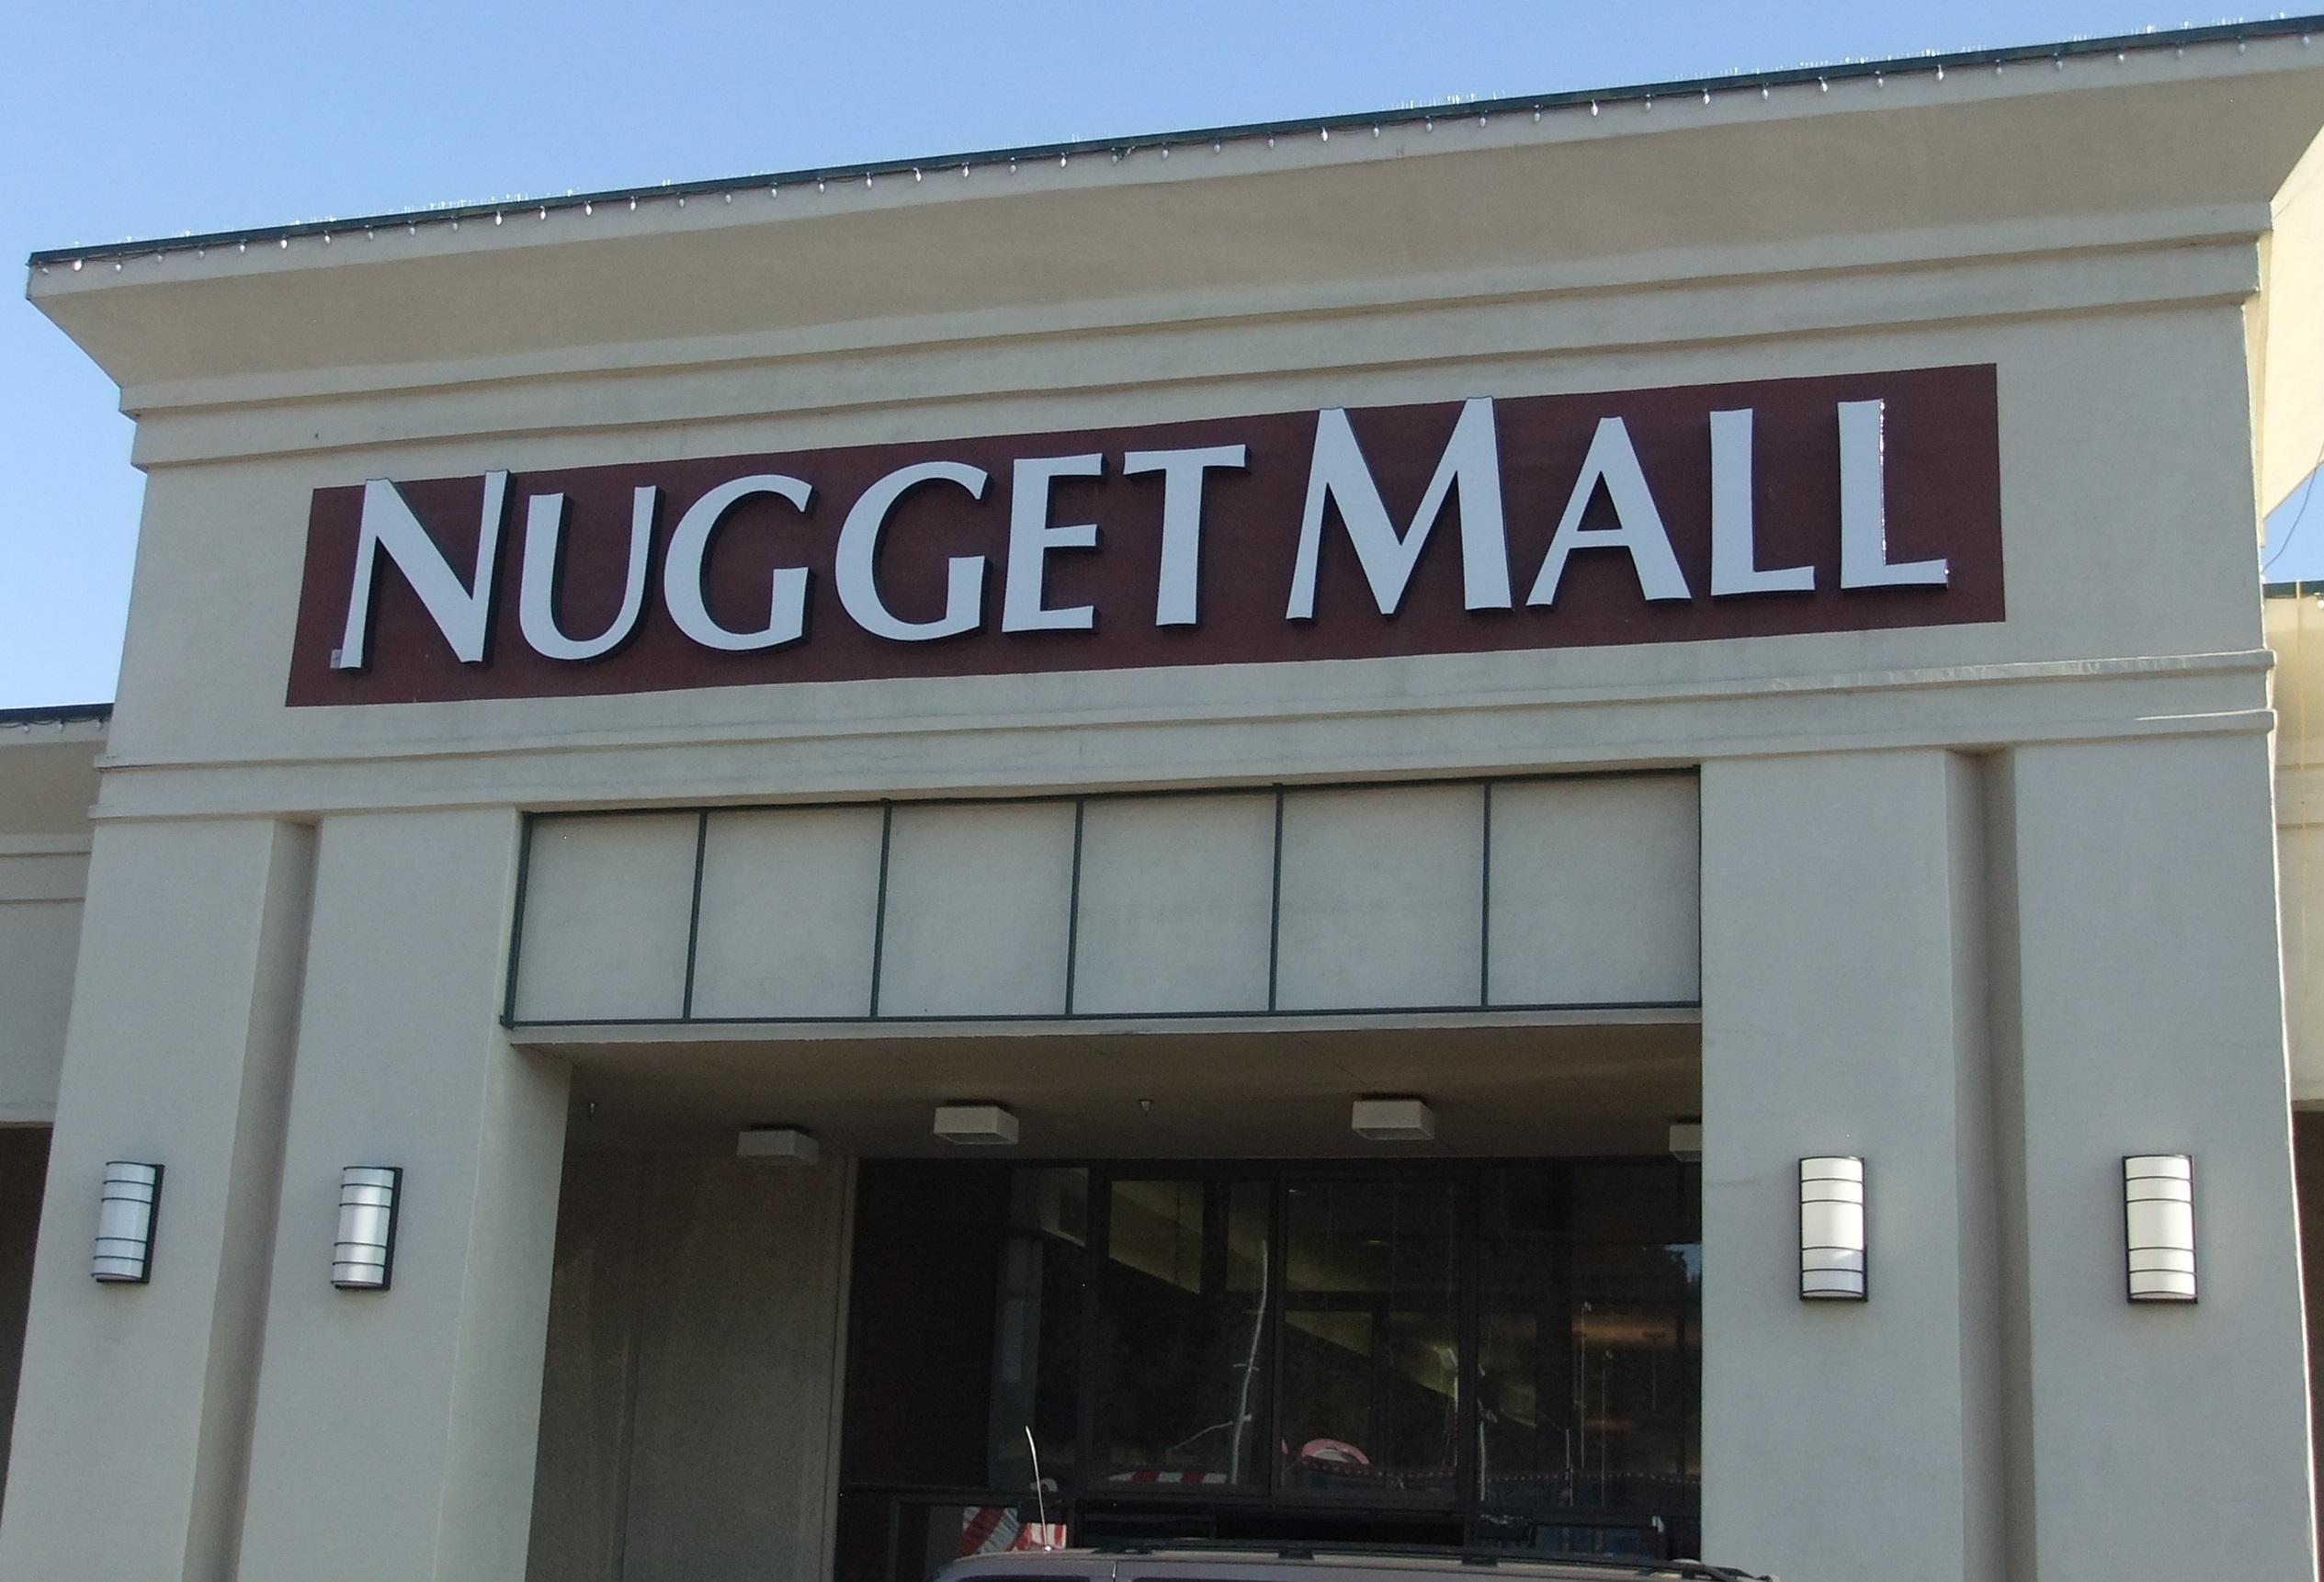 warehouse sportsman mall nugget open juneau sportsmans ktoo sometime rosemarie alexander spring